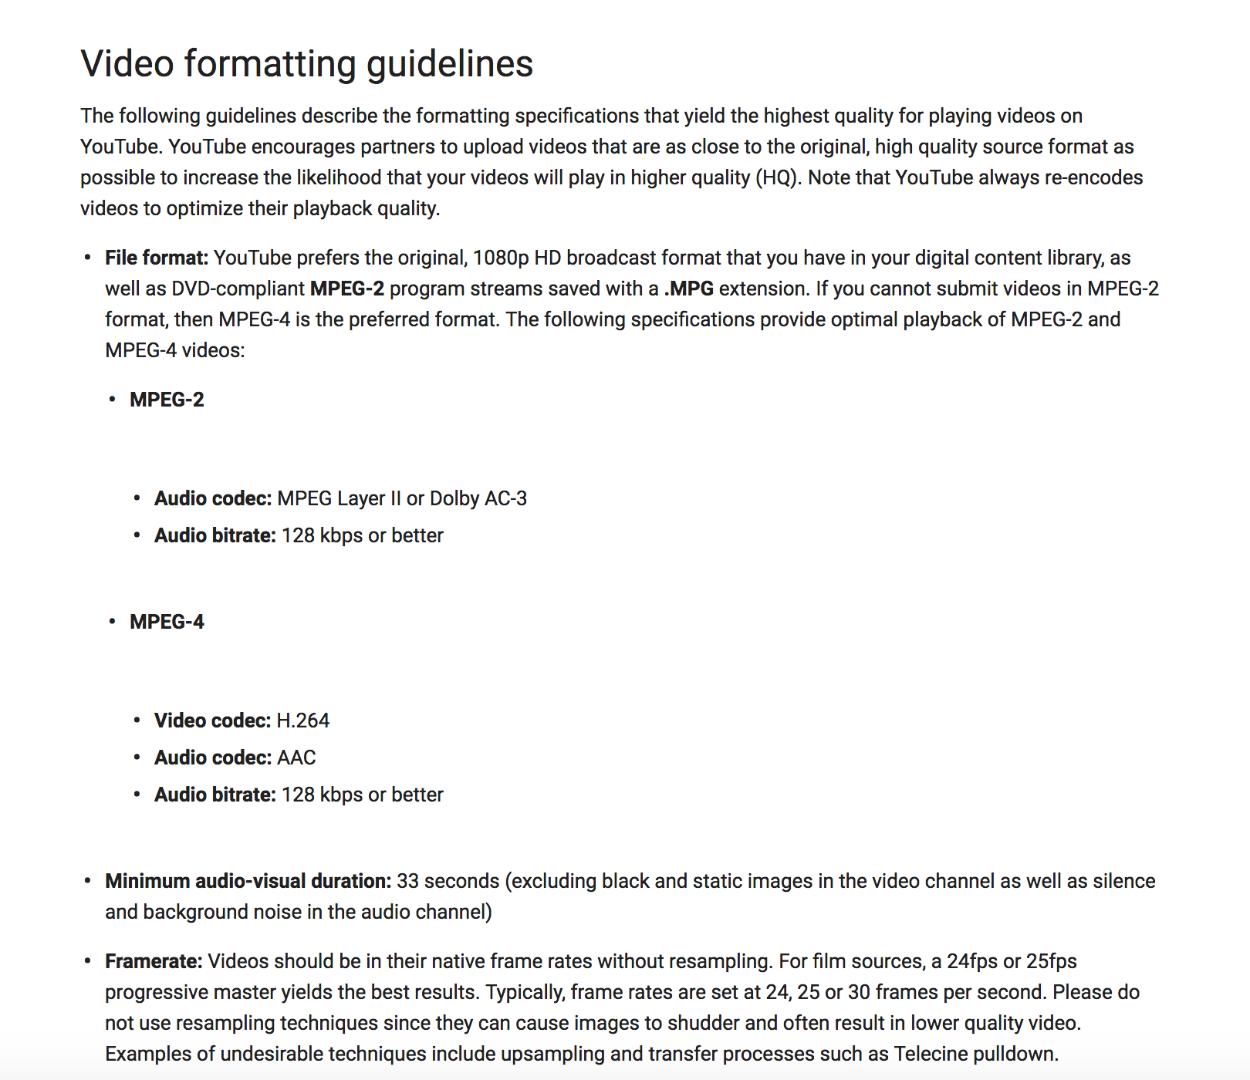 Sharing 10 1 7 to YouTube - Apple Community